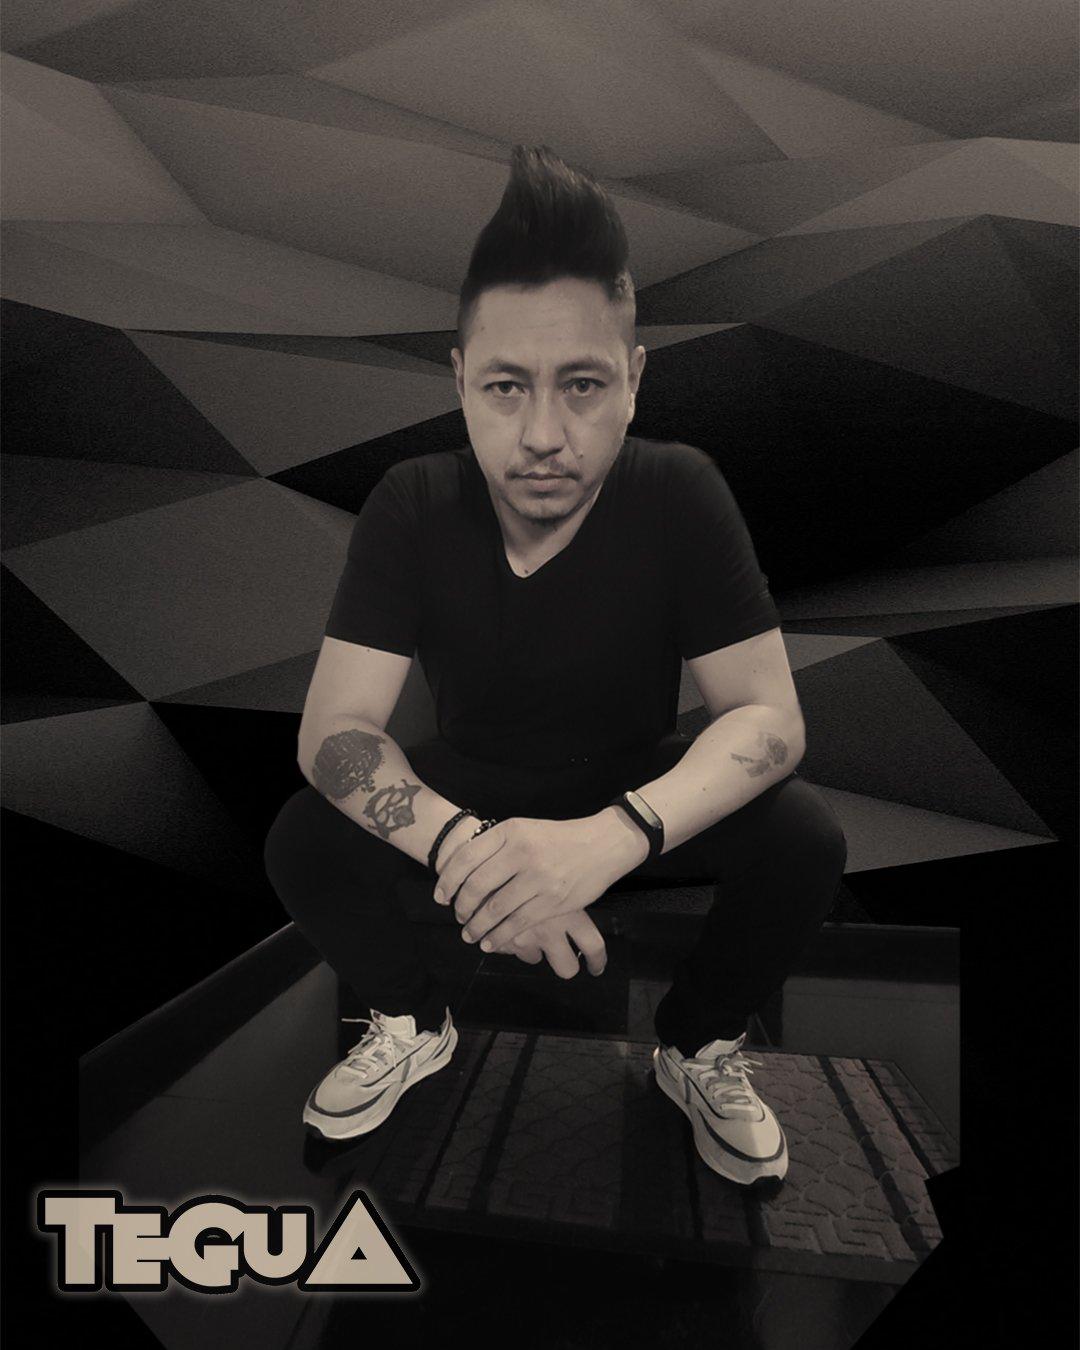 tegua-set-asia - TeGuA New Kid On The Sound - TLS PODCAST